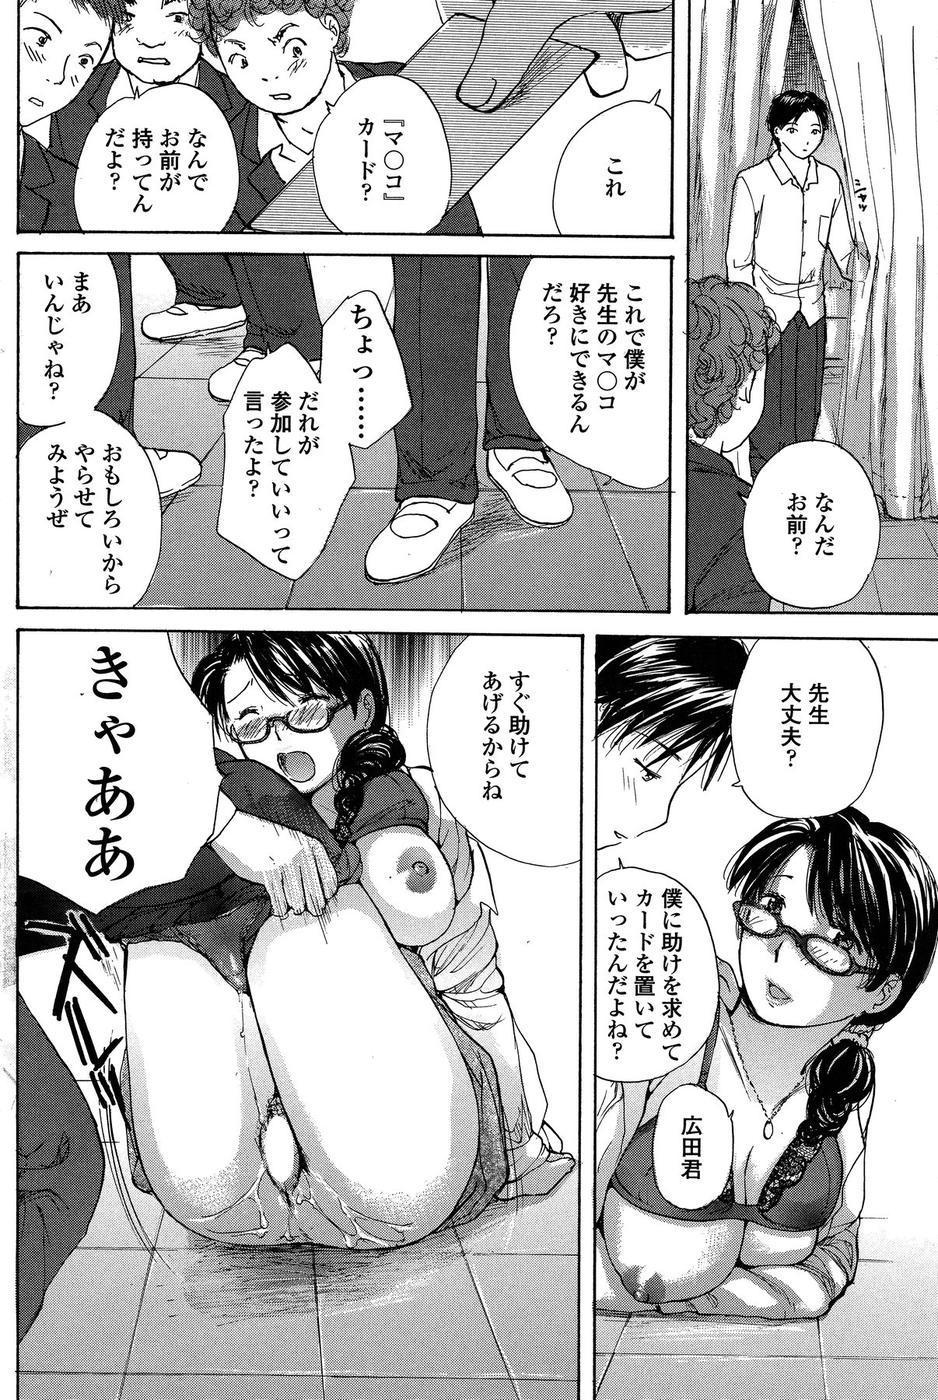 COMIC SIGMA 2009-01 Vol.28 46